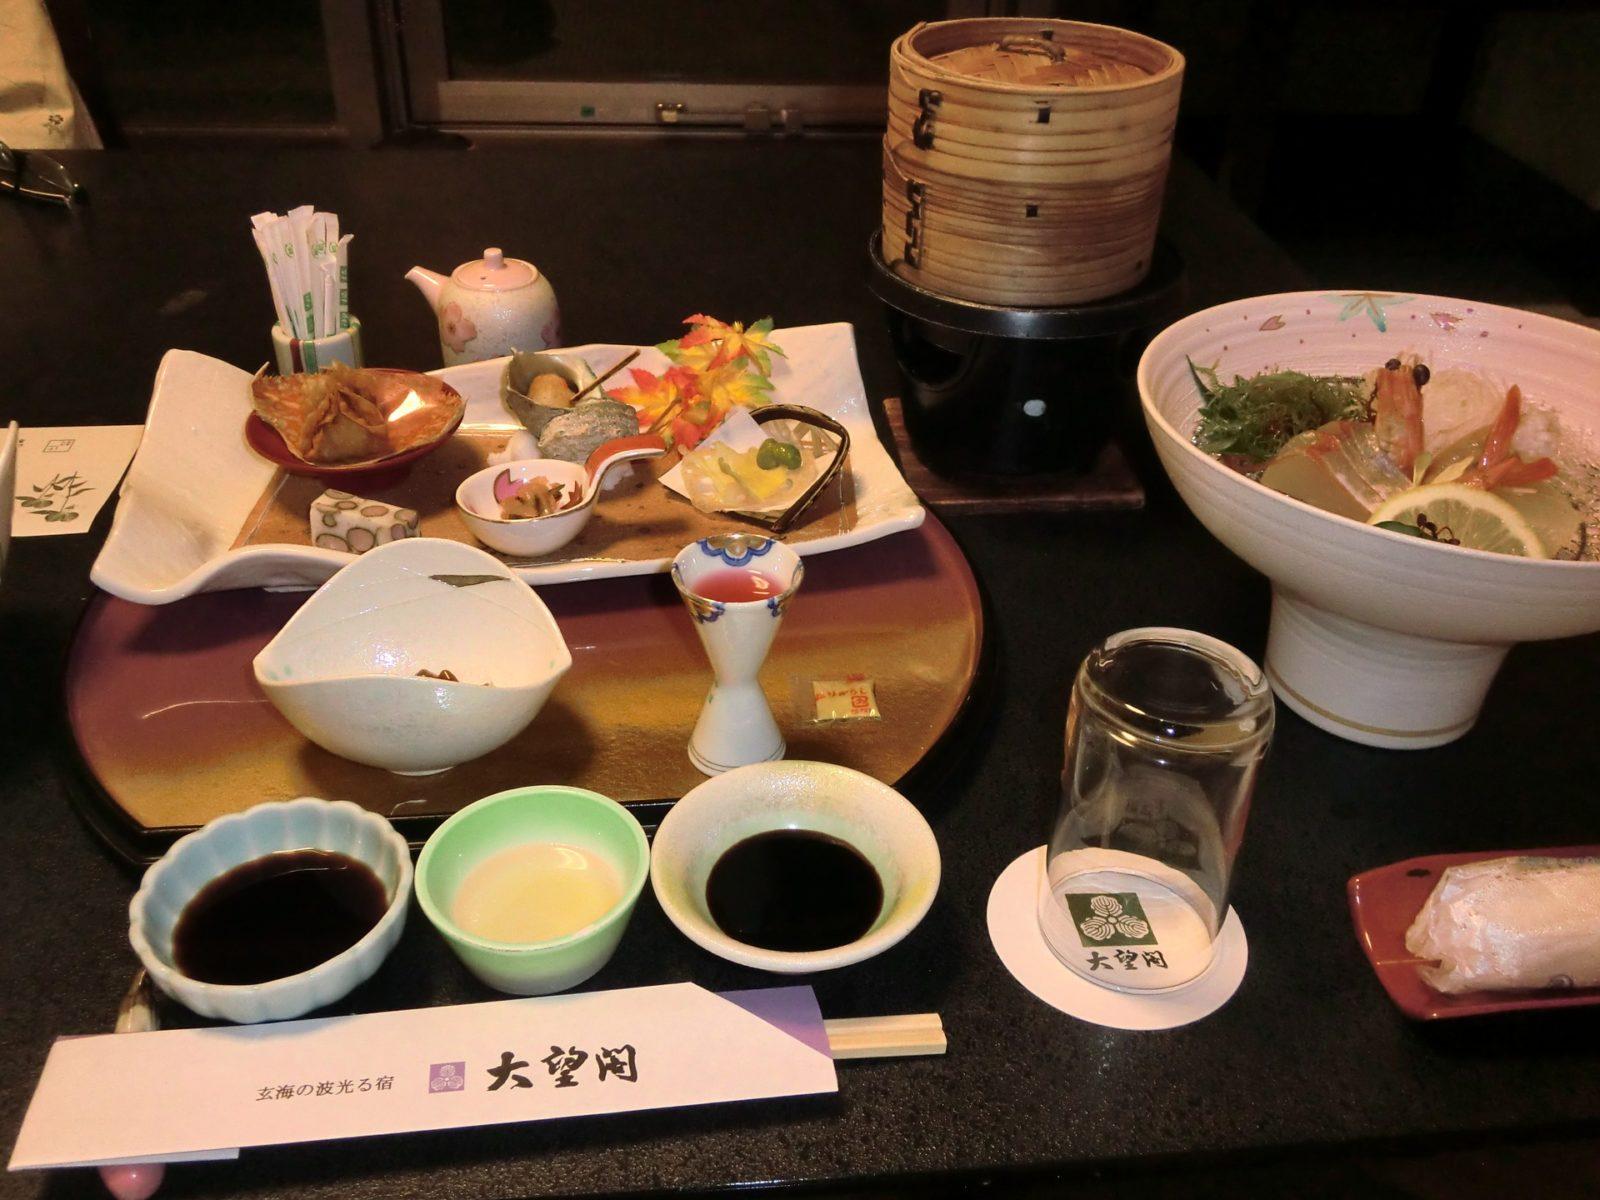 Японская кухня — это душа, а не роллы